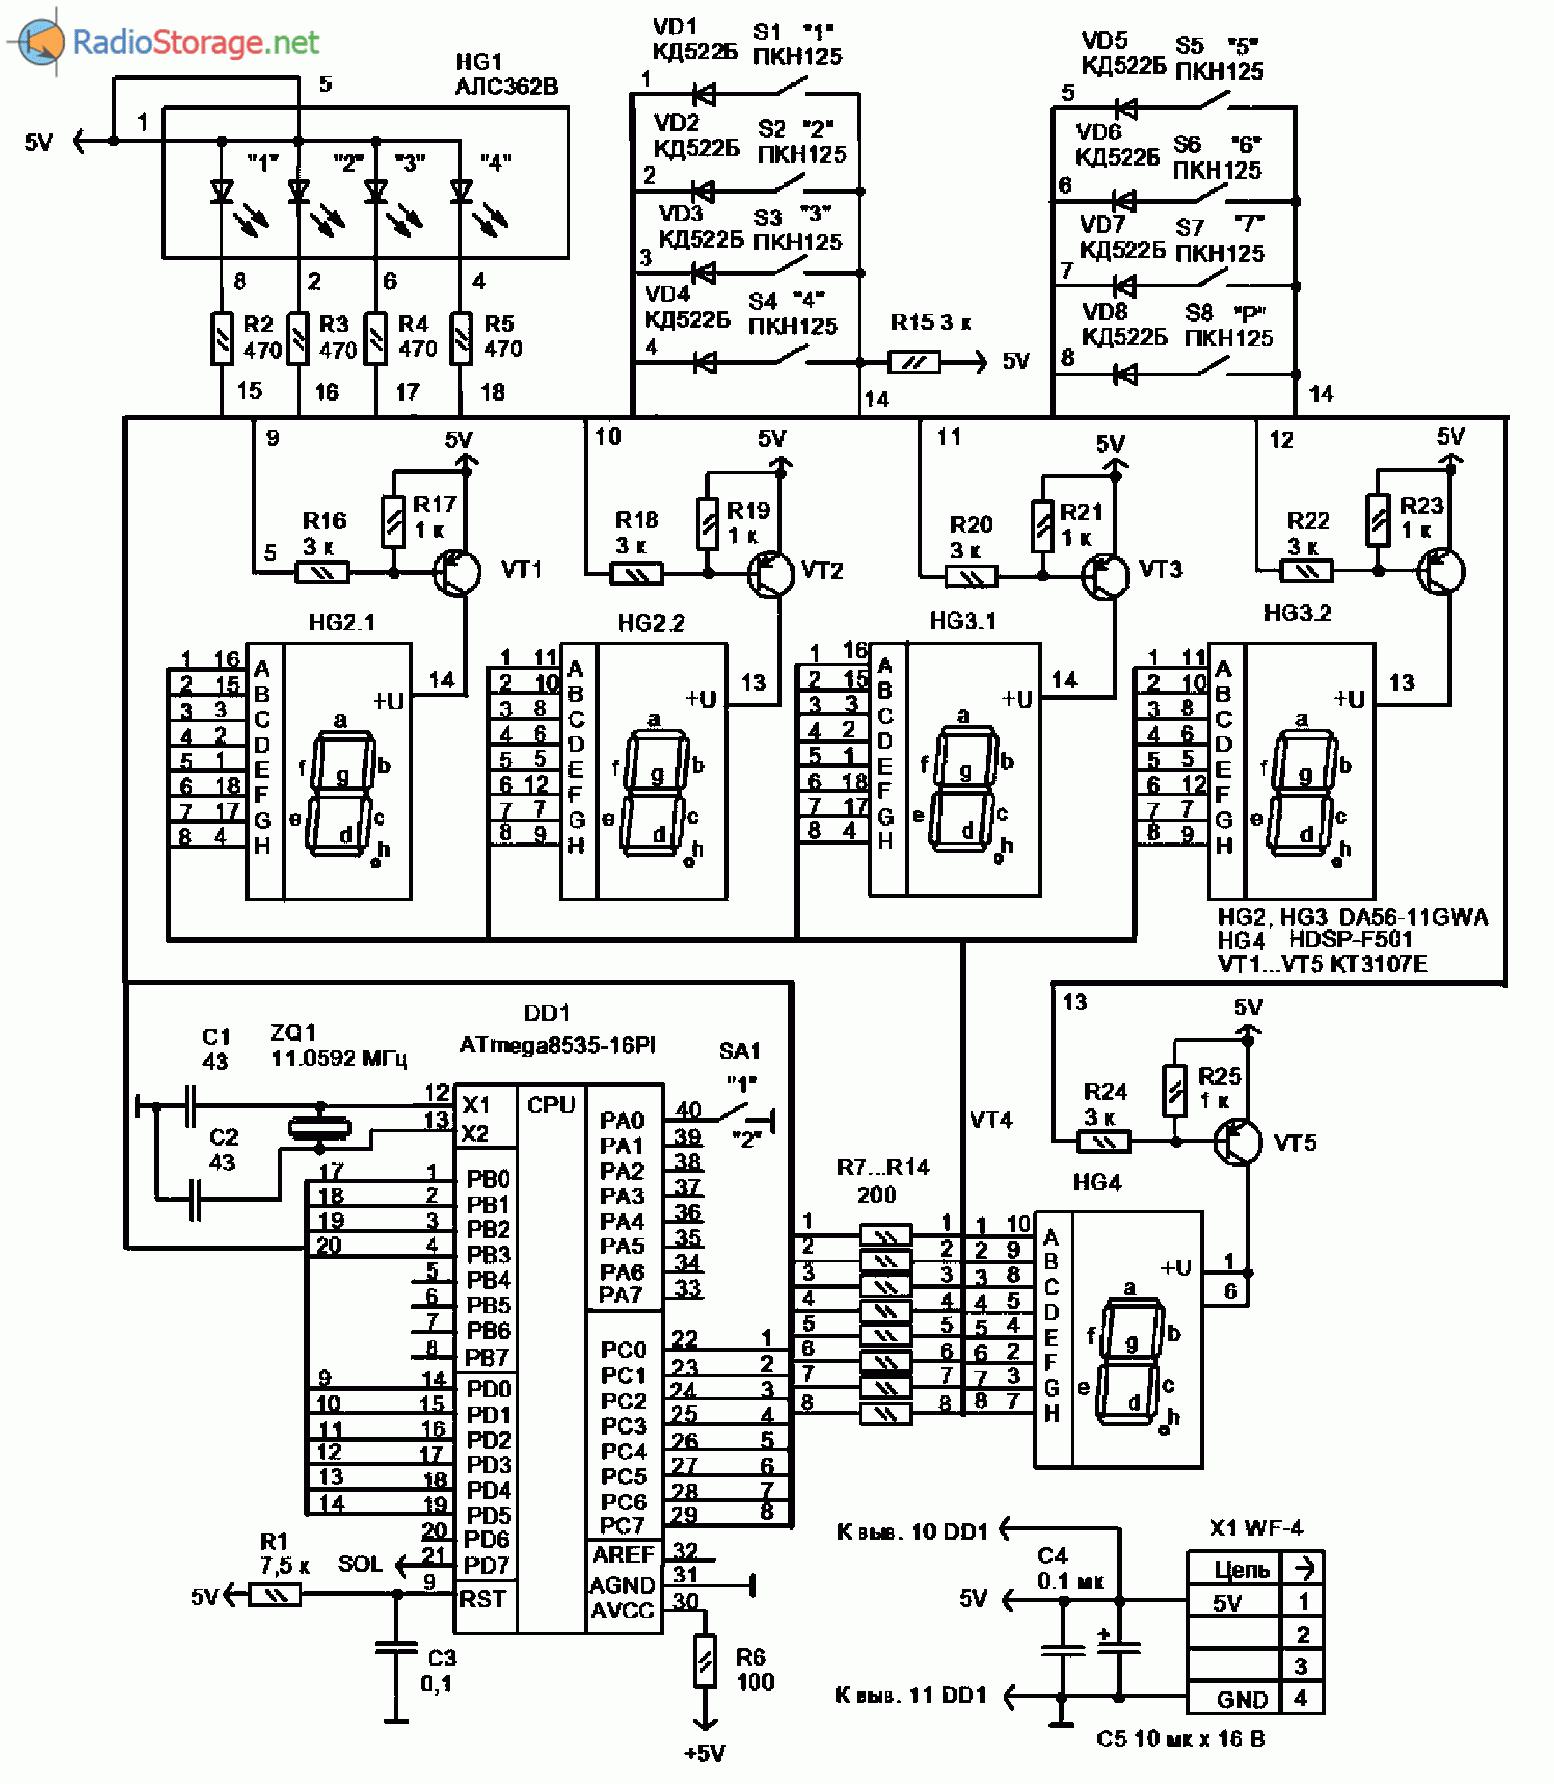 микро радиоприемник на микроконтроллере схема